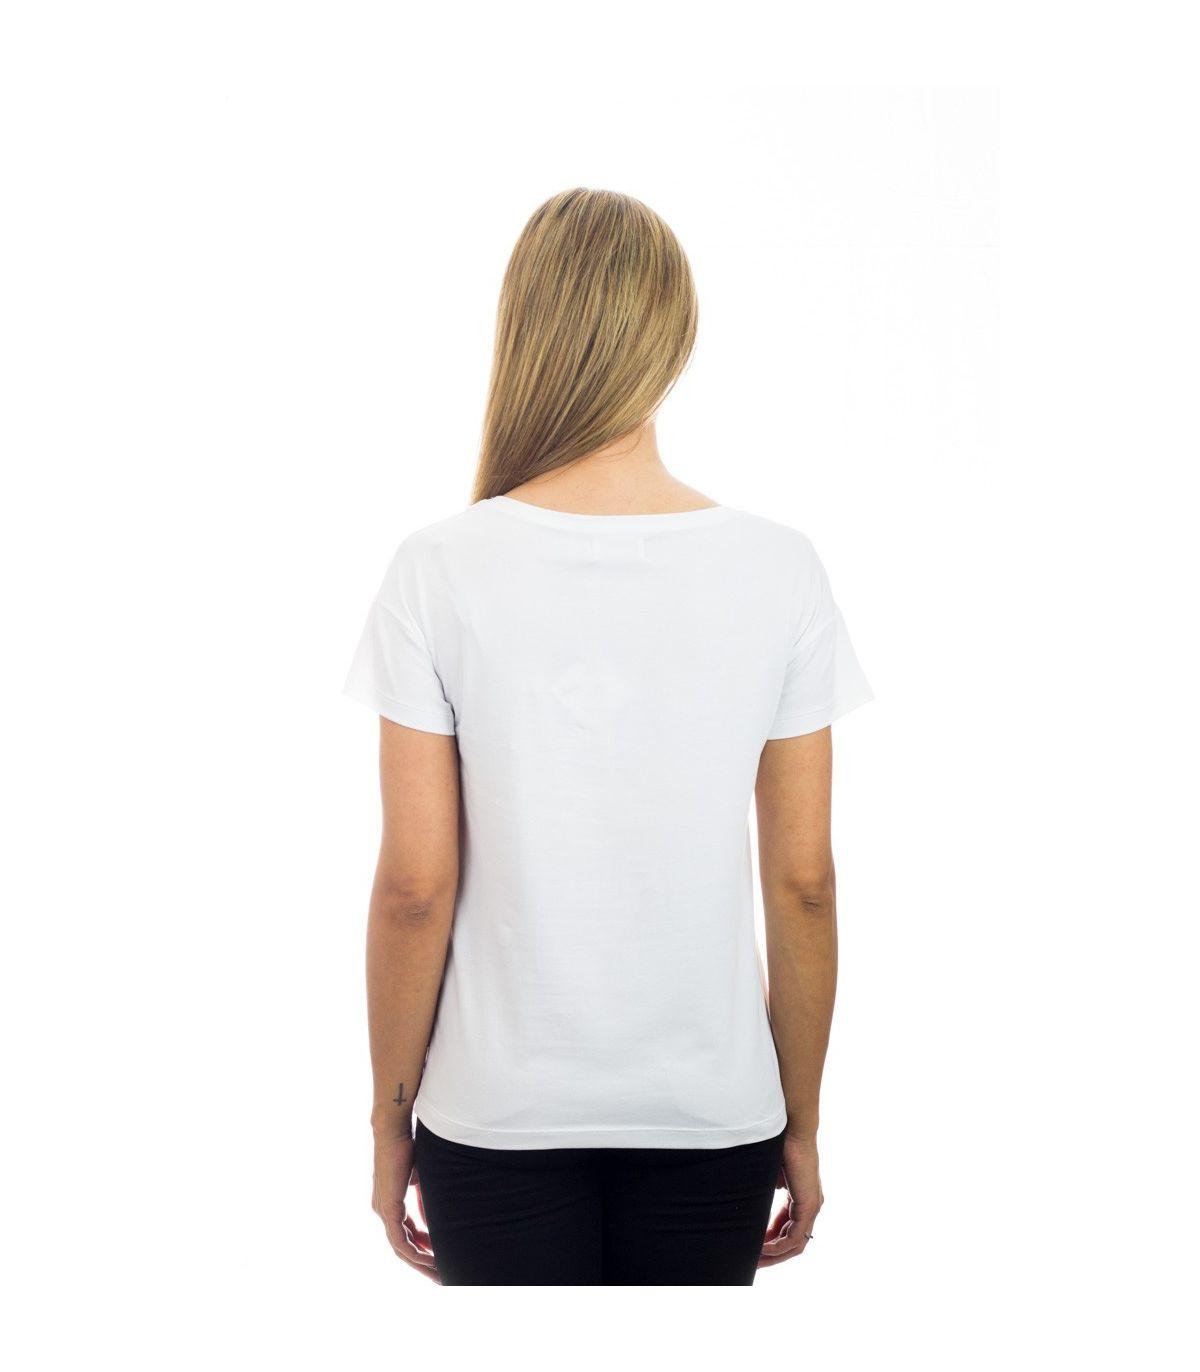 Camiseta Marilyn Reina